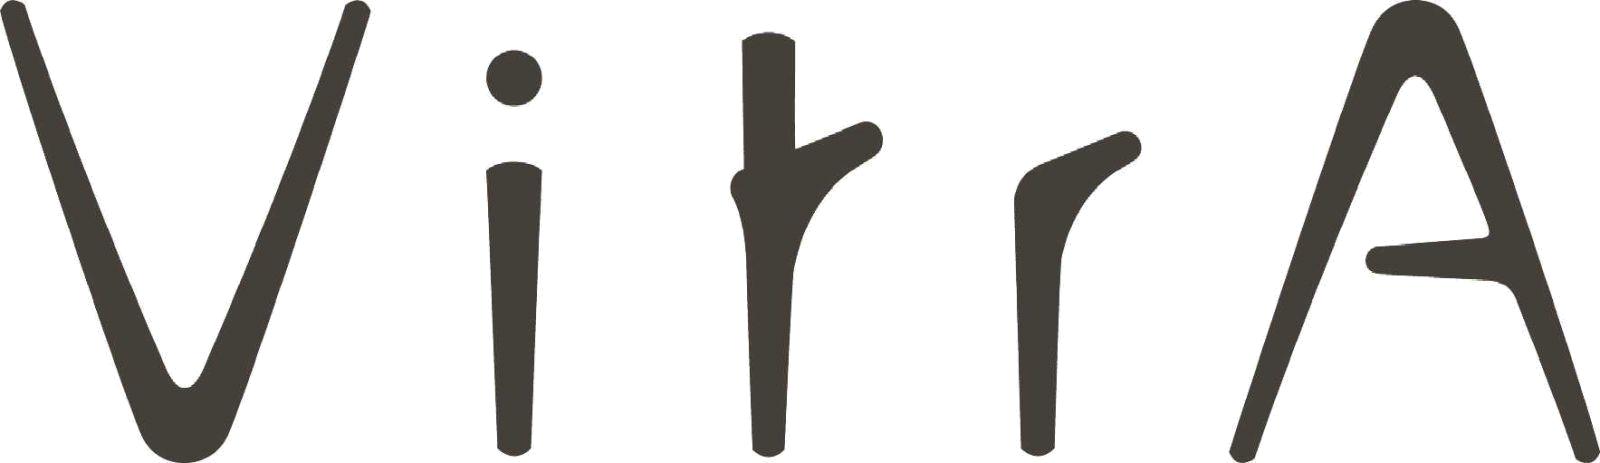 Раковина-умывальник Vitra (Витра) для ванной комнаты